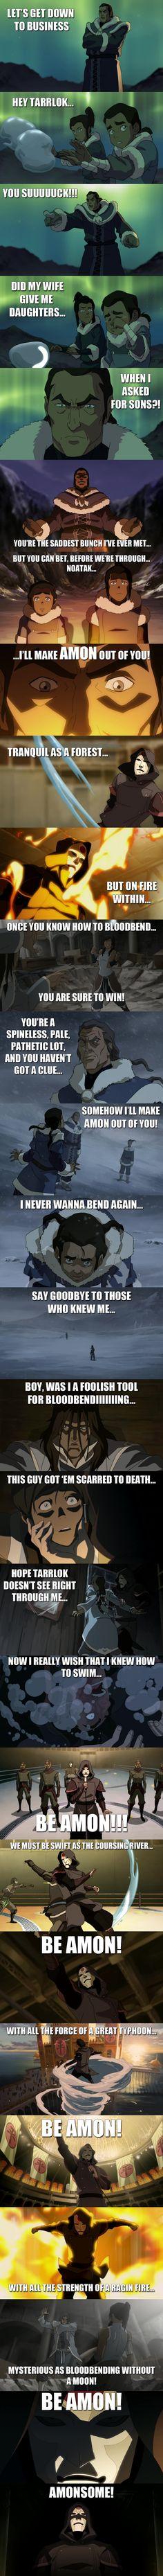 The Legend of Korra meets Mulan: I'll Make Amon Out of You!  FTW!